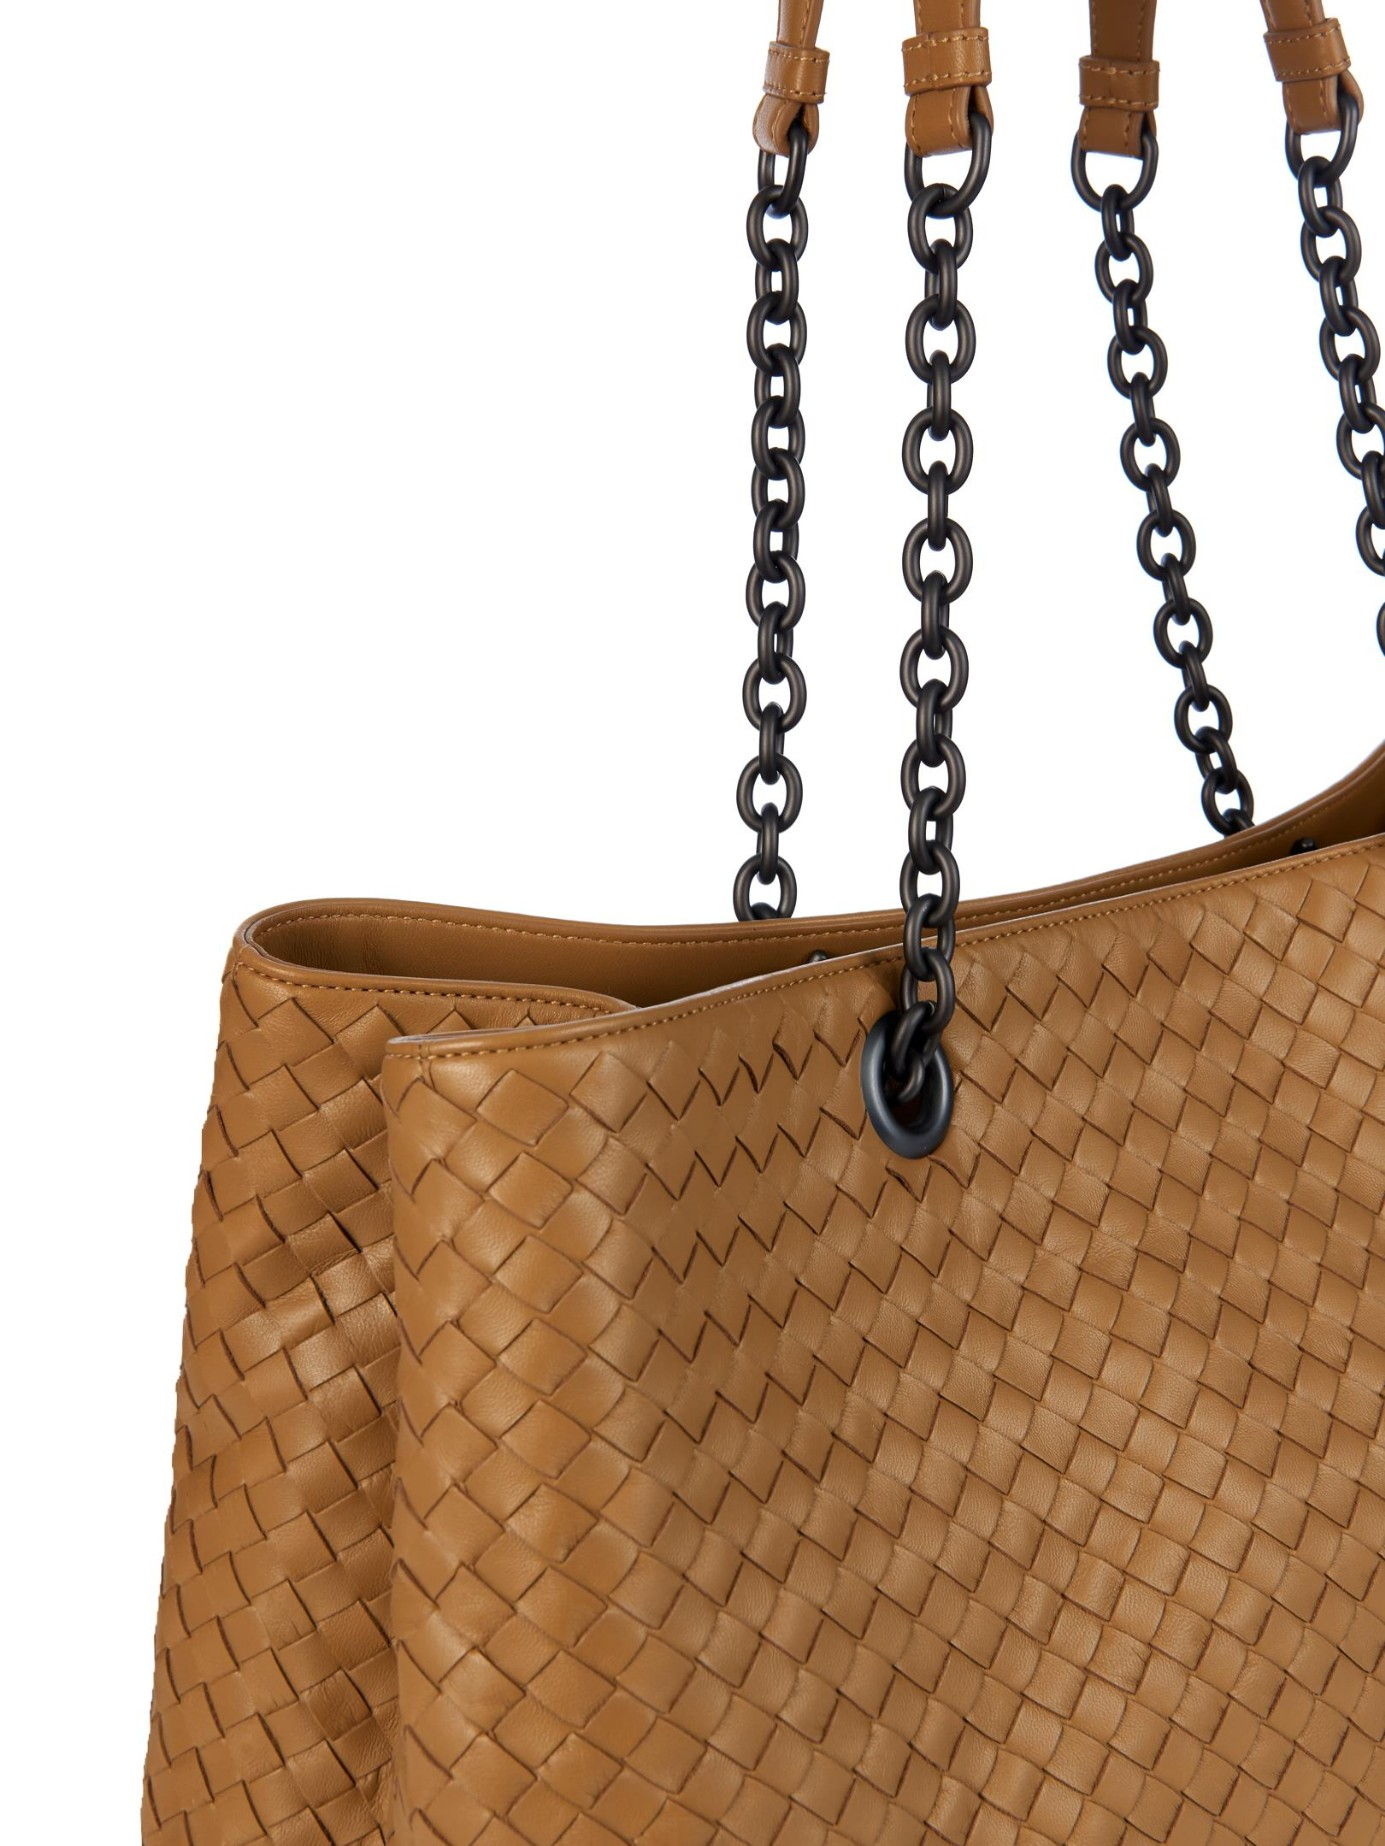 Bottega Veneta Intrecciato Double-handle Leather Tote in Natural - Lyst 7d2932a530d78